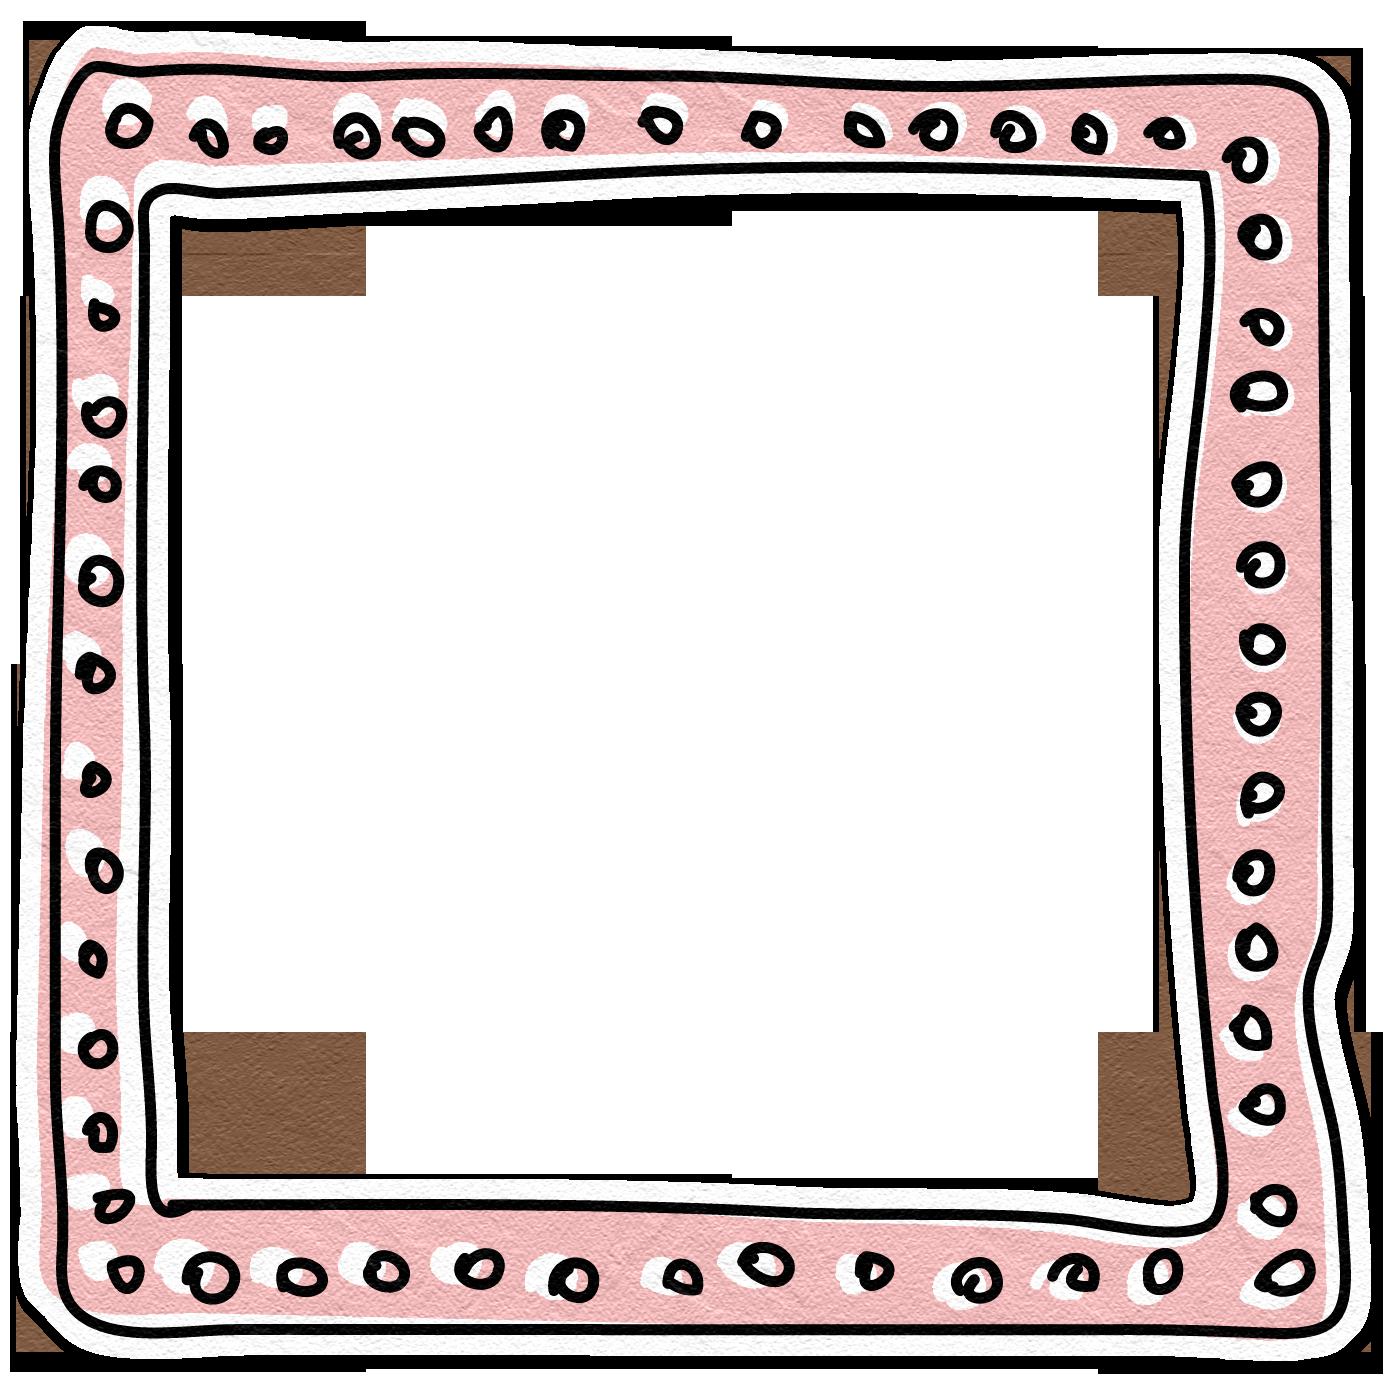 Picture frames clip art. Doodle border png